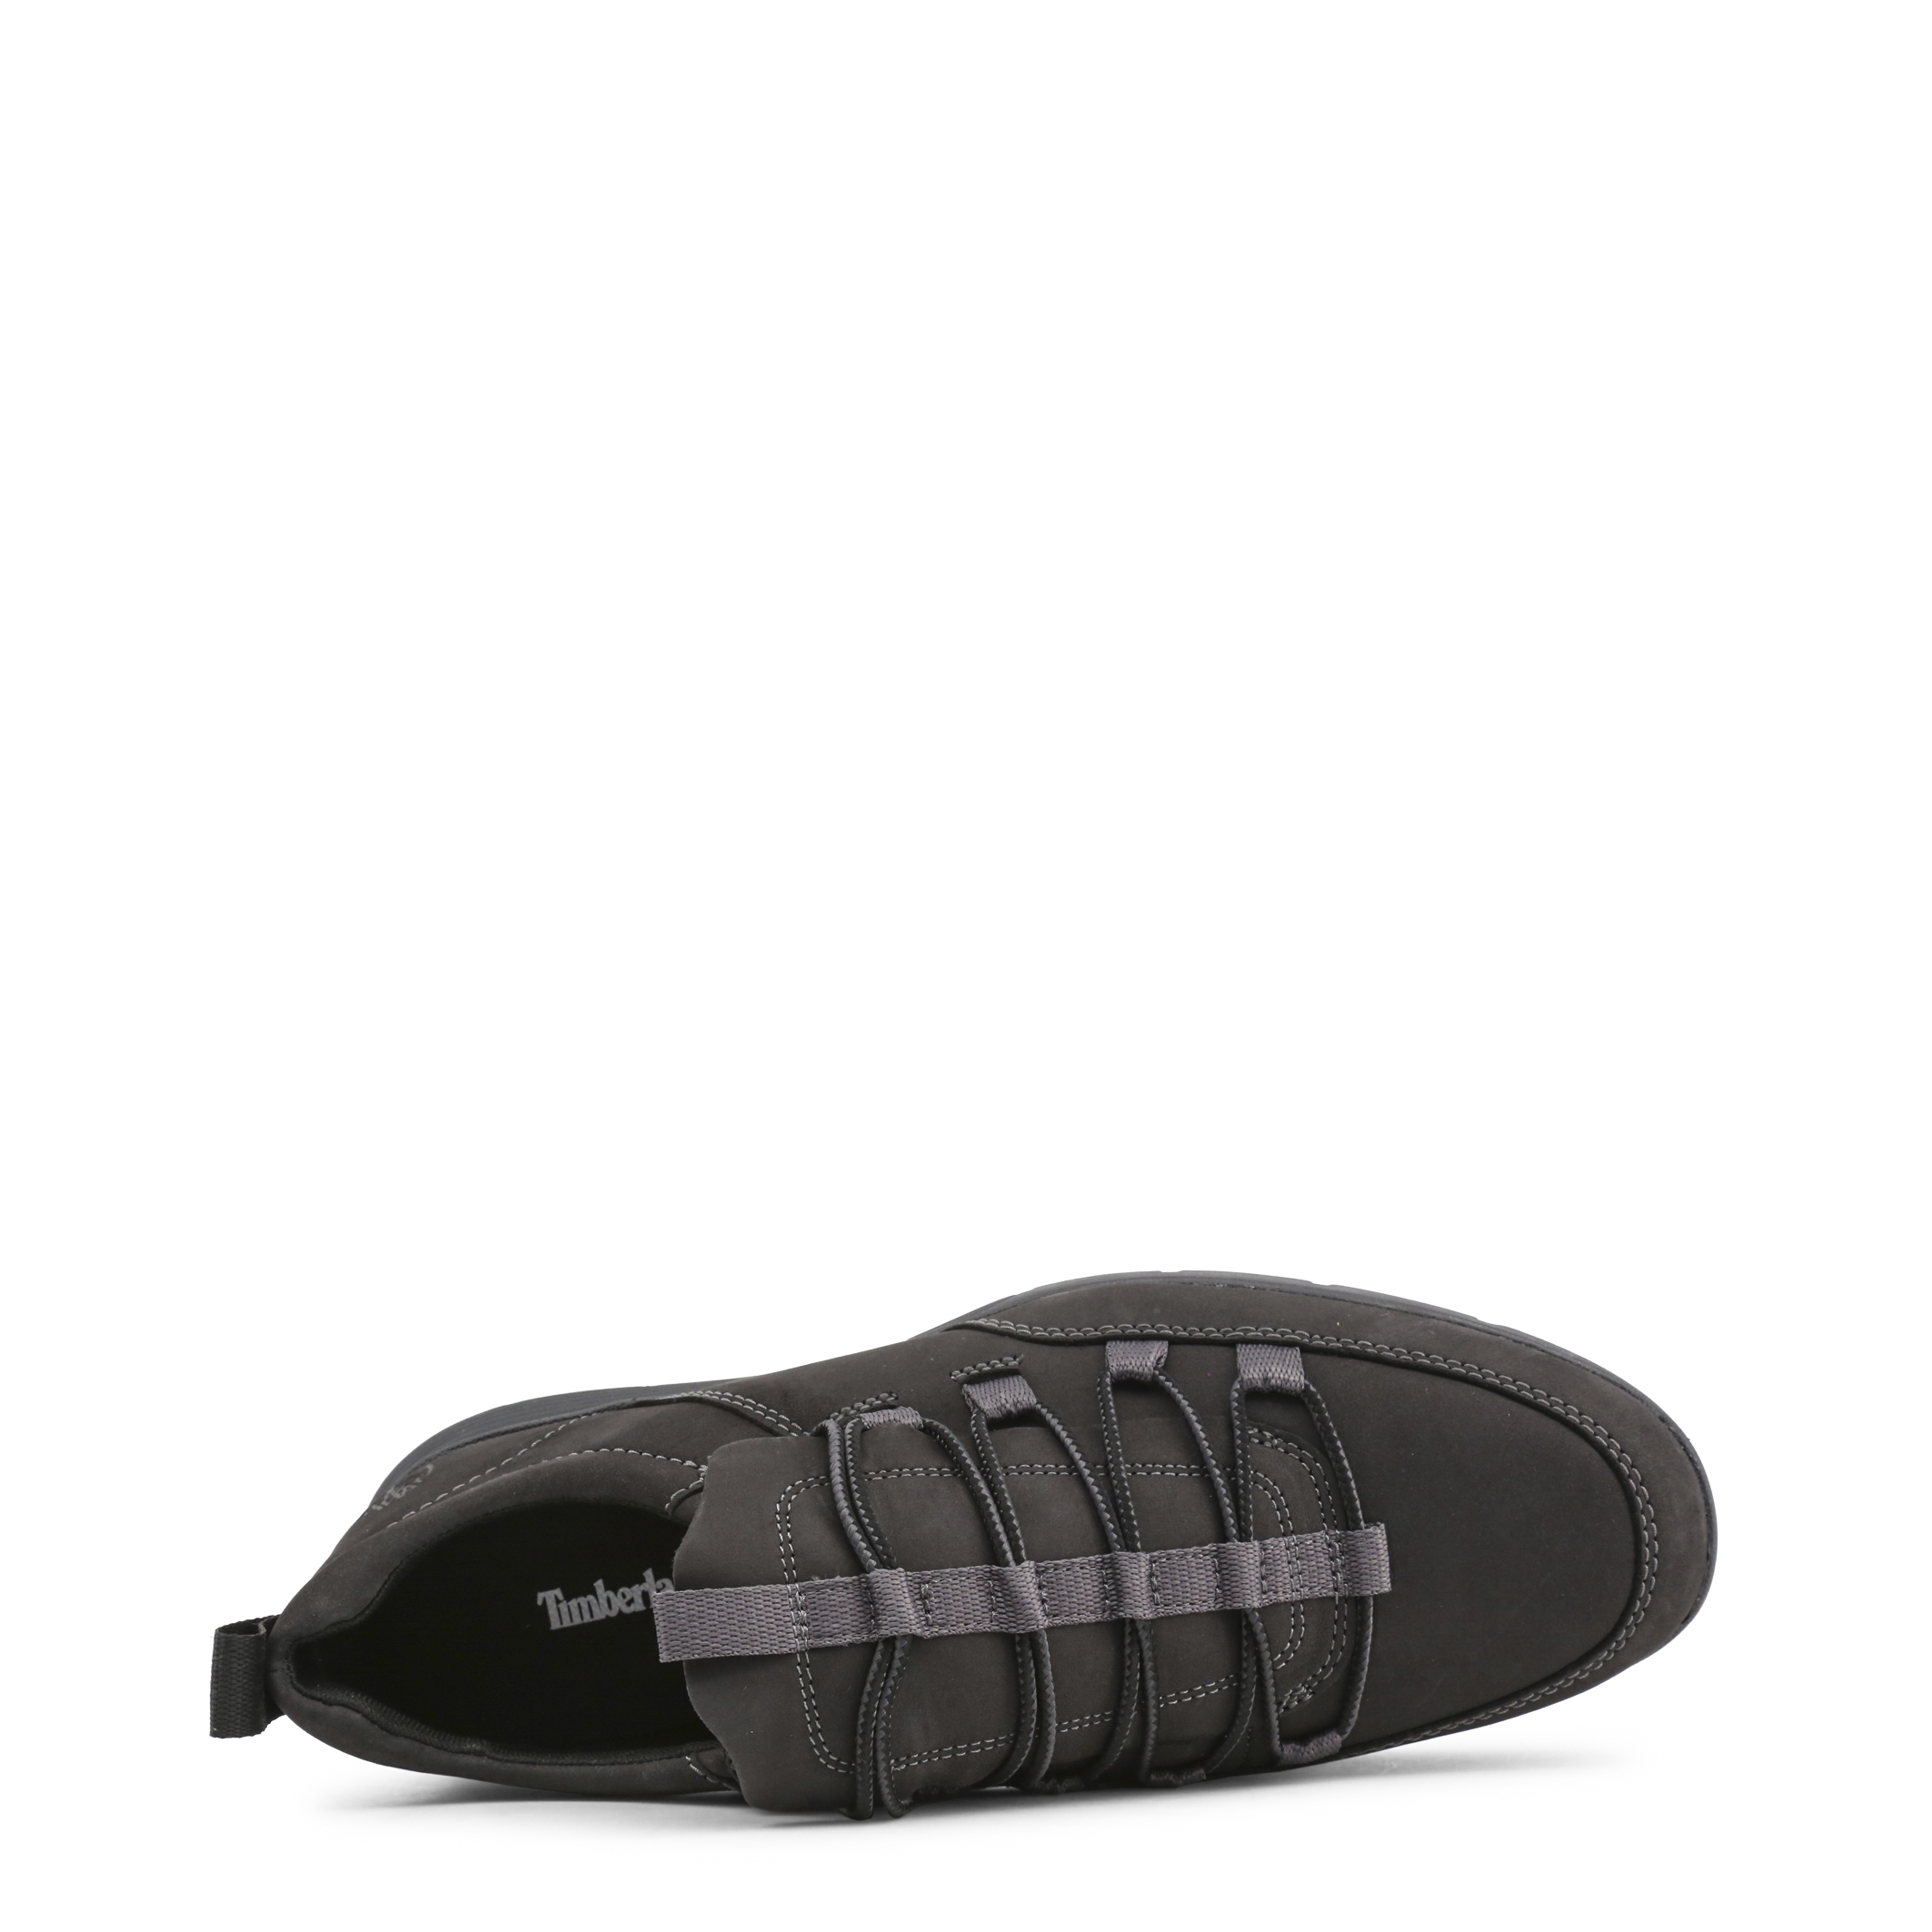 Sneakers-Timberland-KILLINGTON-TB0A1O-Uomo-Grigio-94751 miniatura 3